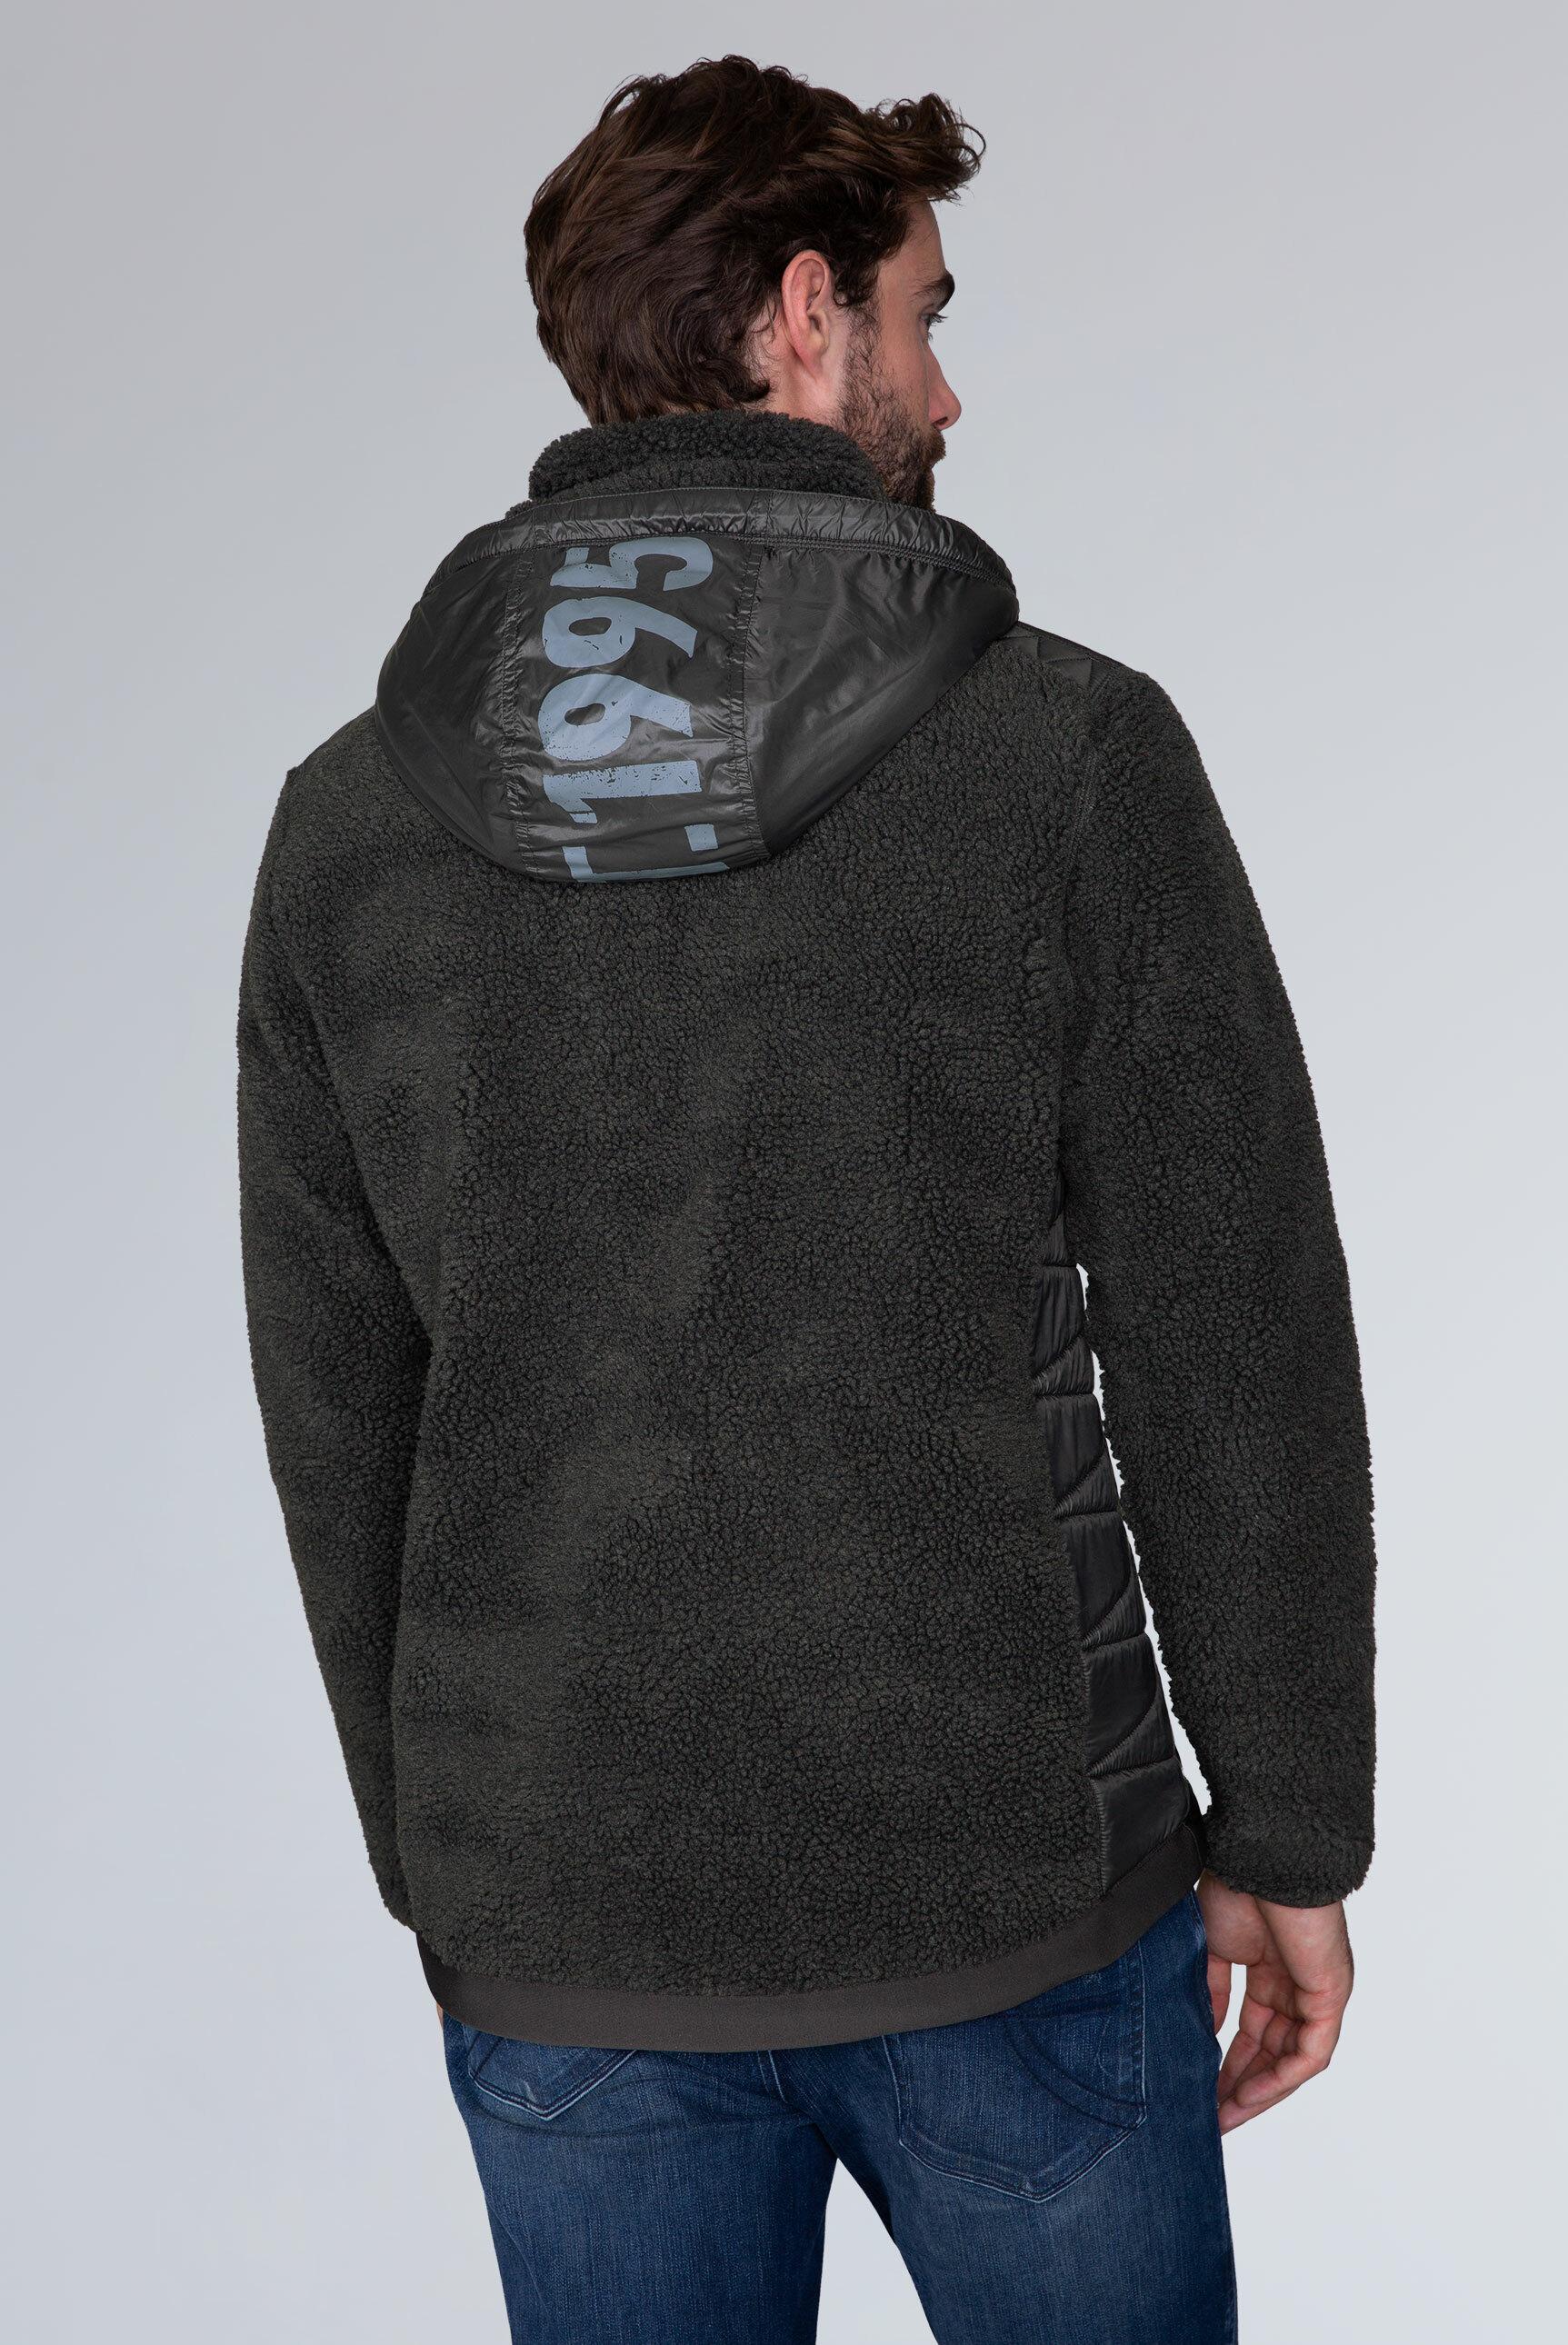 Jacke aus Teddyfleece mit Nylon-Kapuze